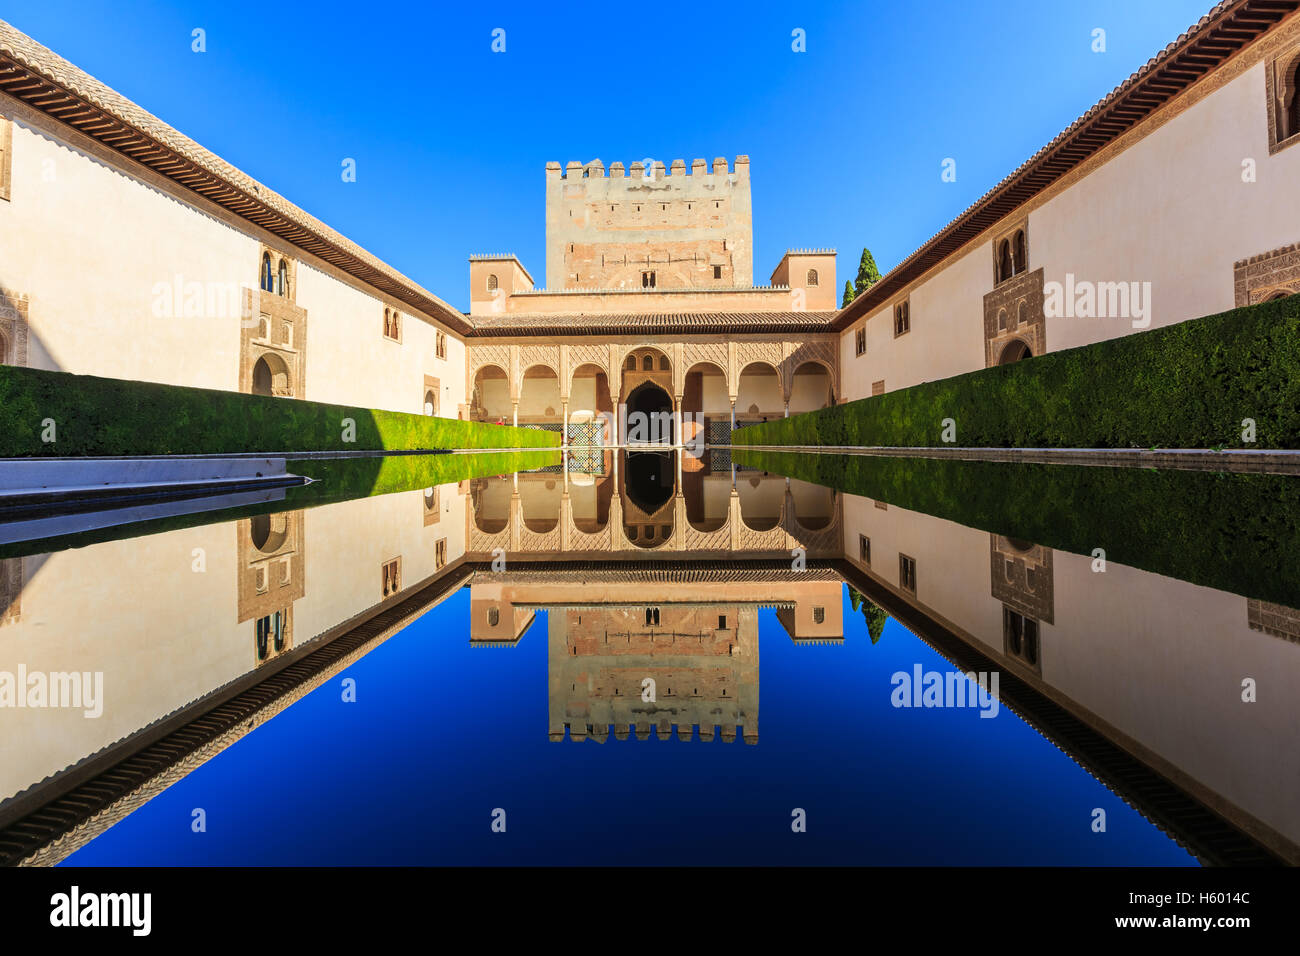 Alhambra of Granada, Spain. - Stock Image